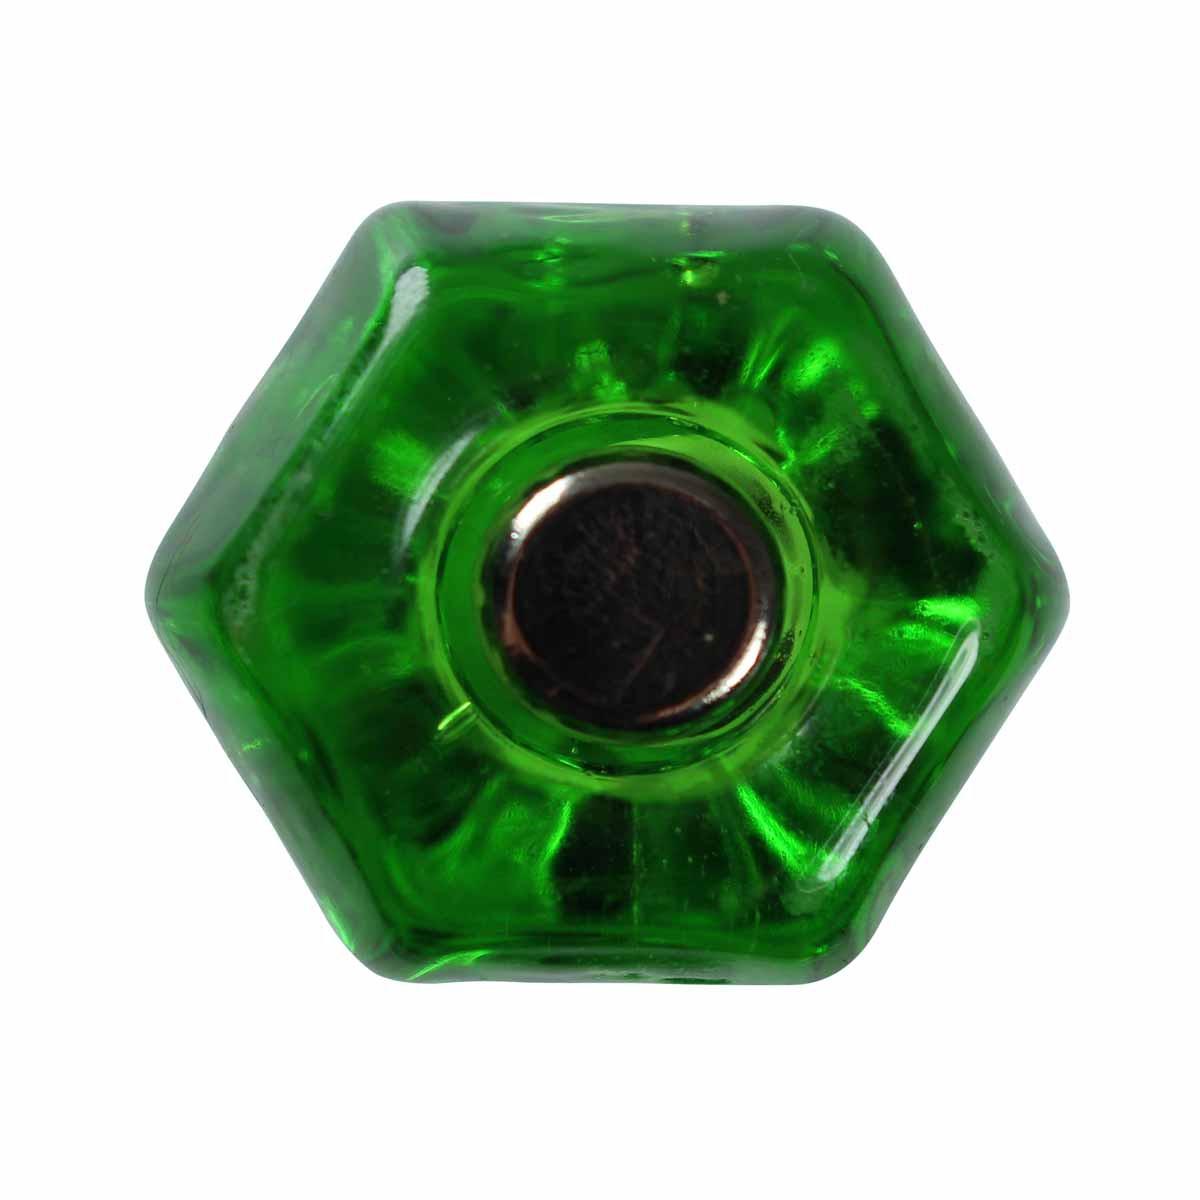 Cabinet Knob Forest Green Glass 1 Dia W Chrome Screw Cabinet Hardware Cabinet Knobs Cabinet Knob